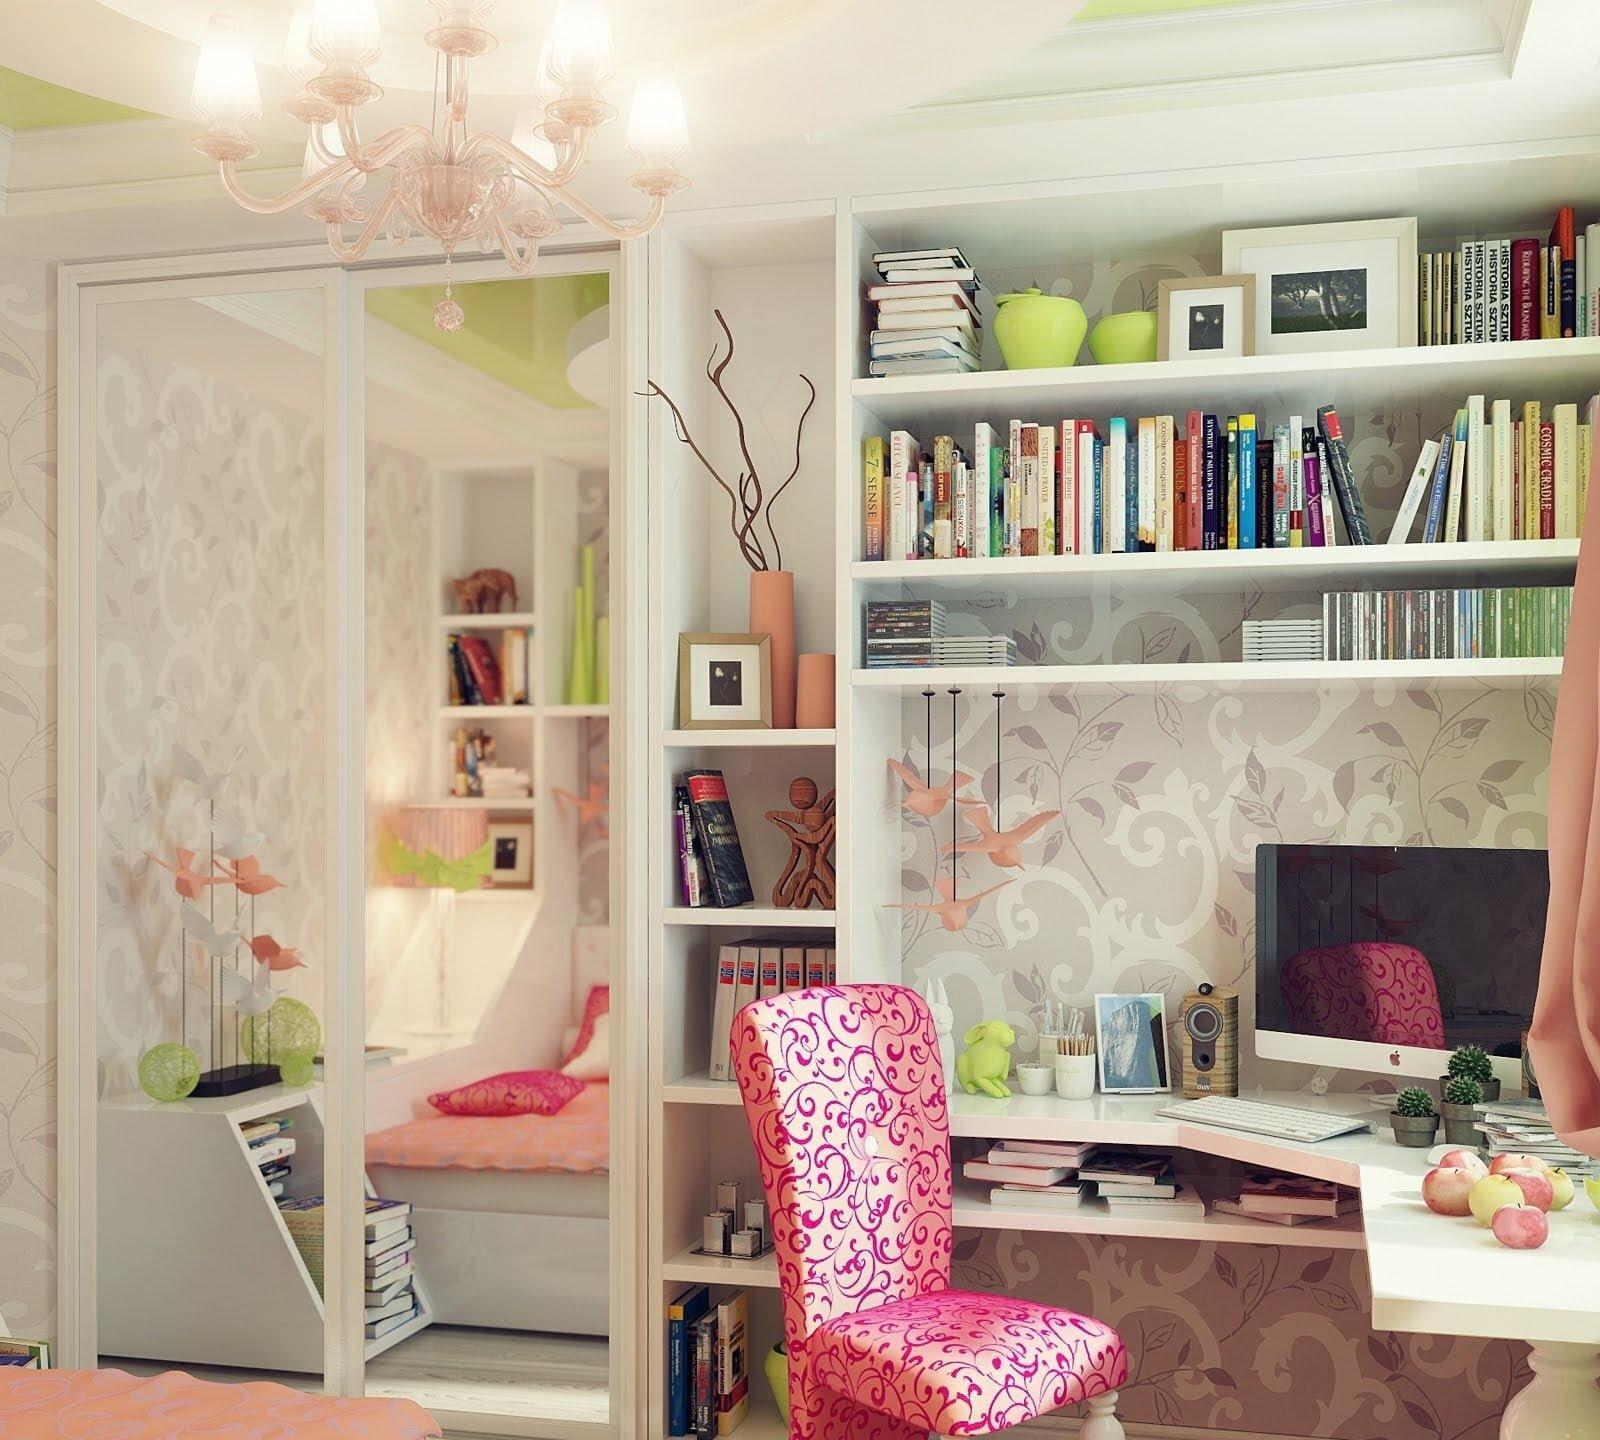 genç kız odası  (1)